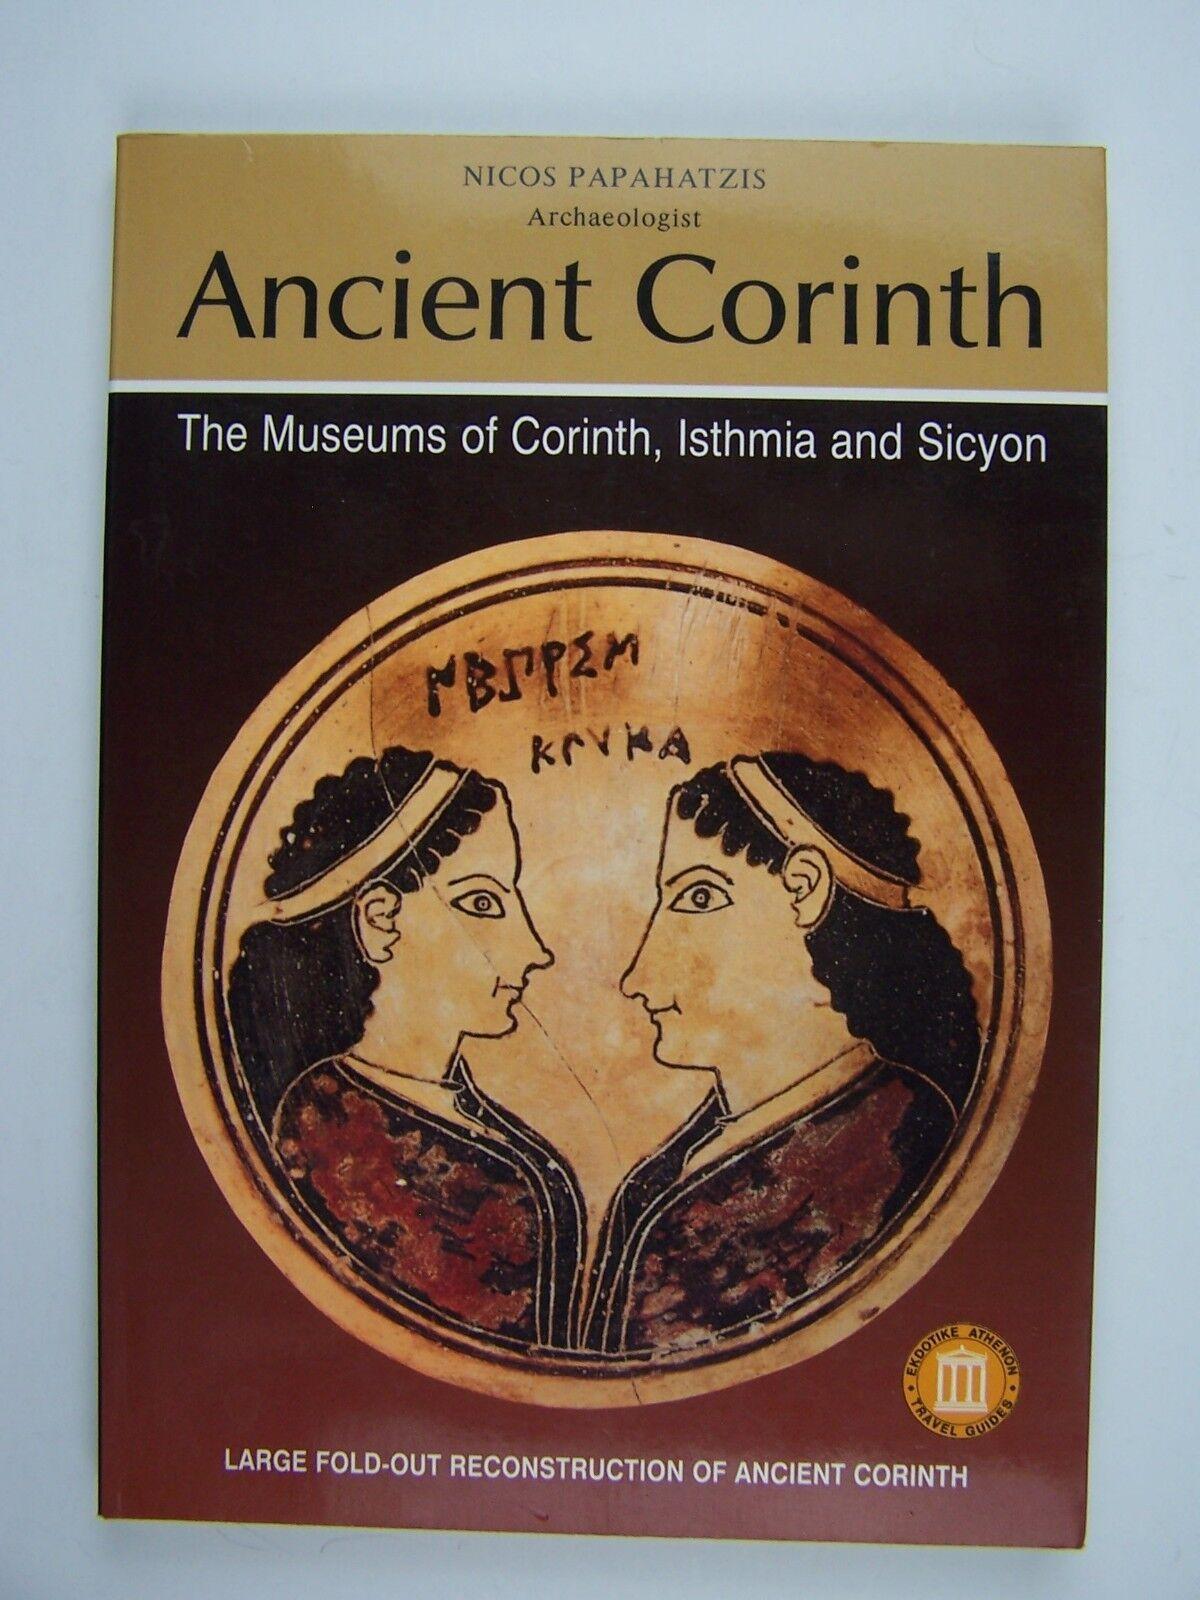 Ancient Corinth Paperback by Nicos Papahatzis